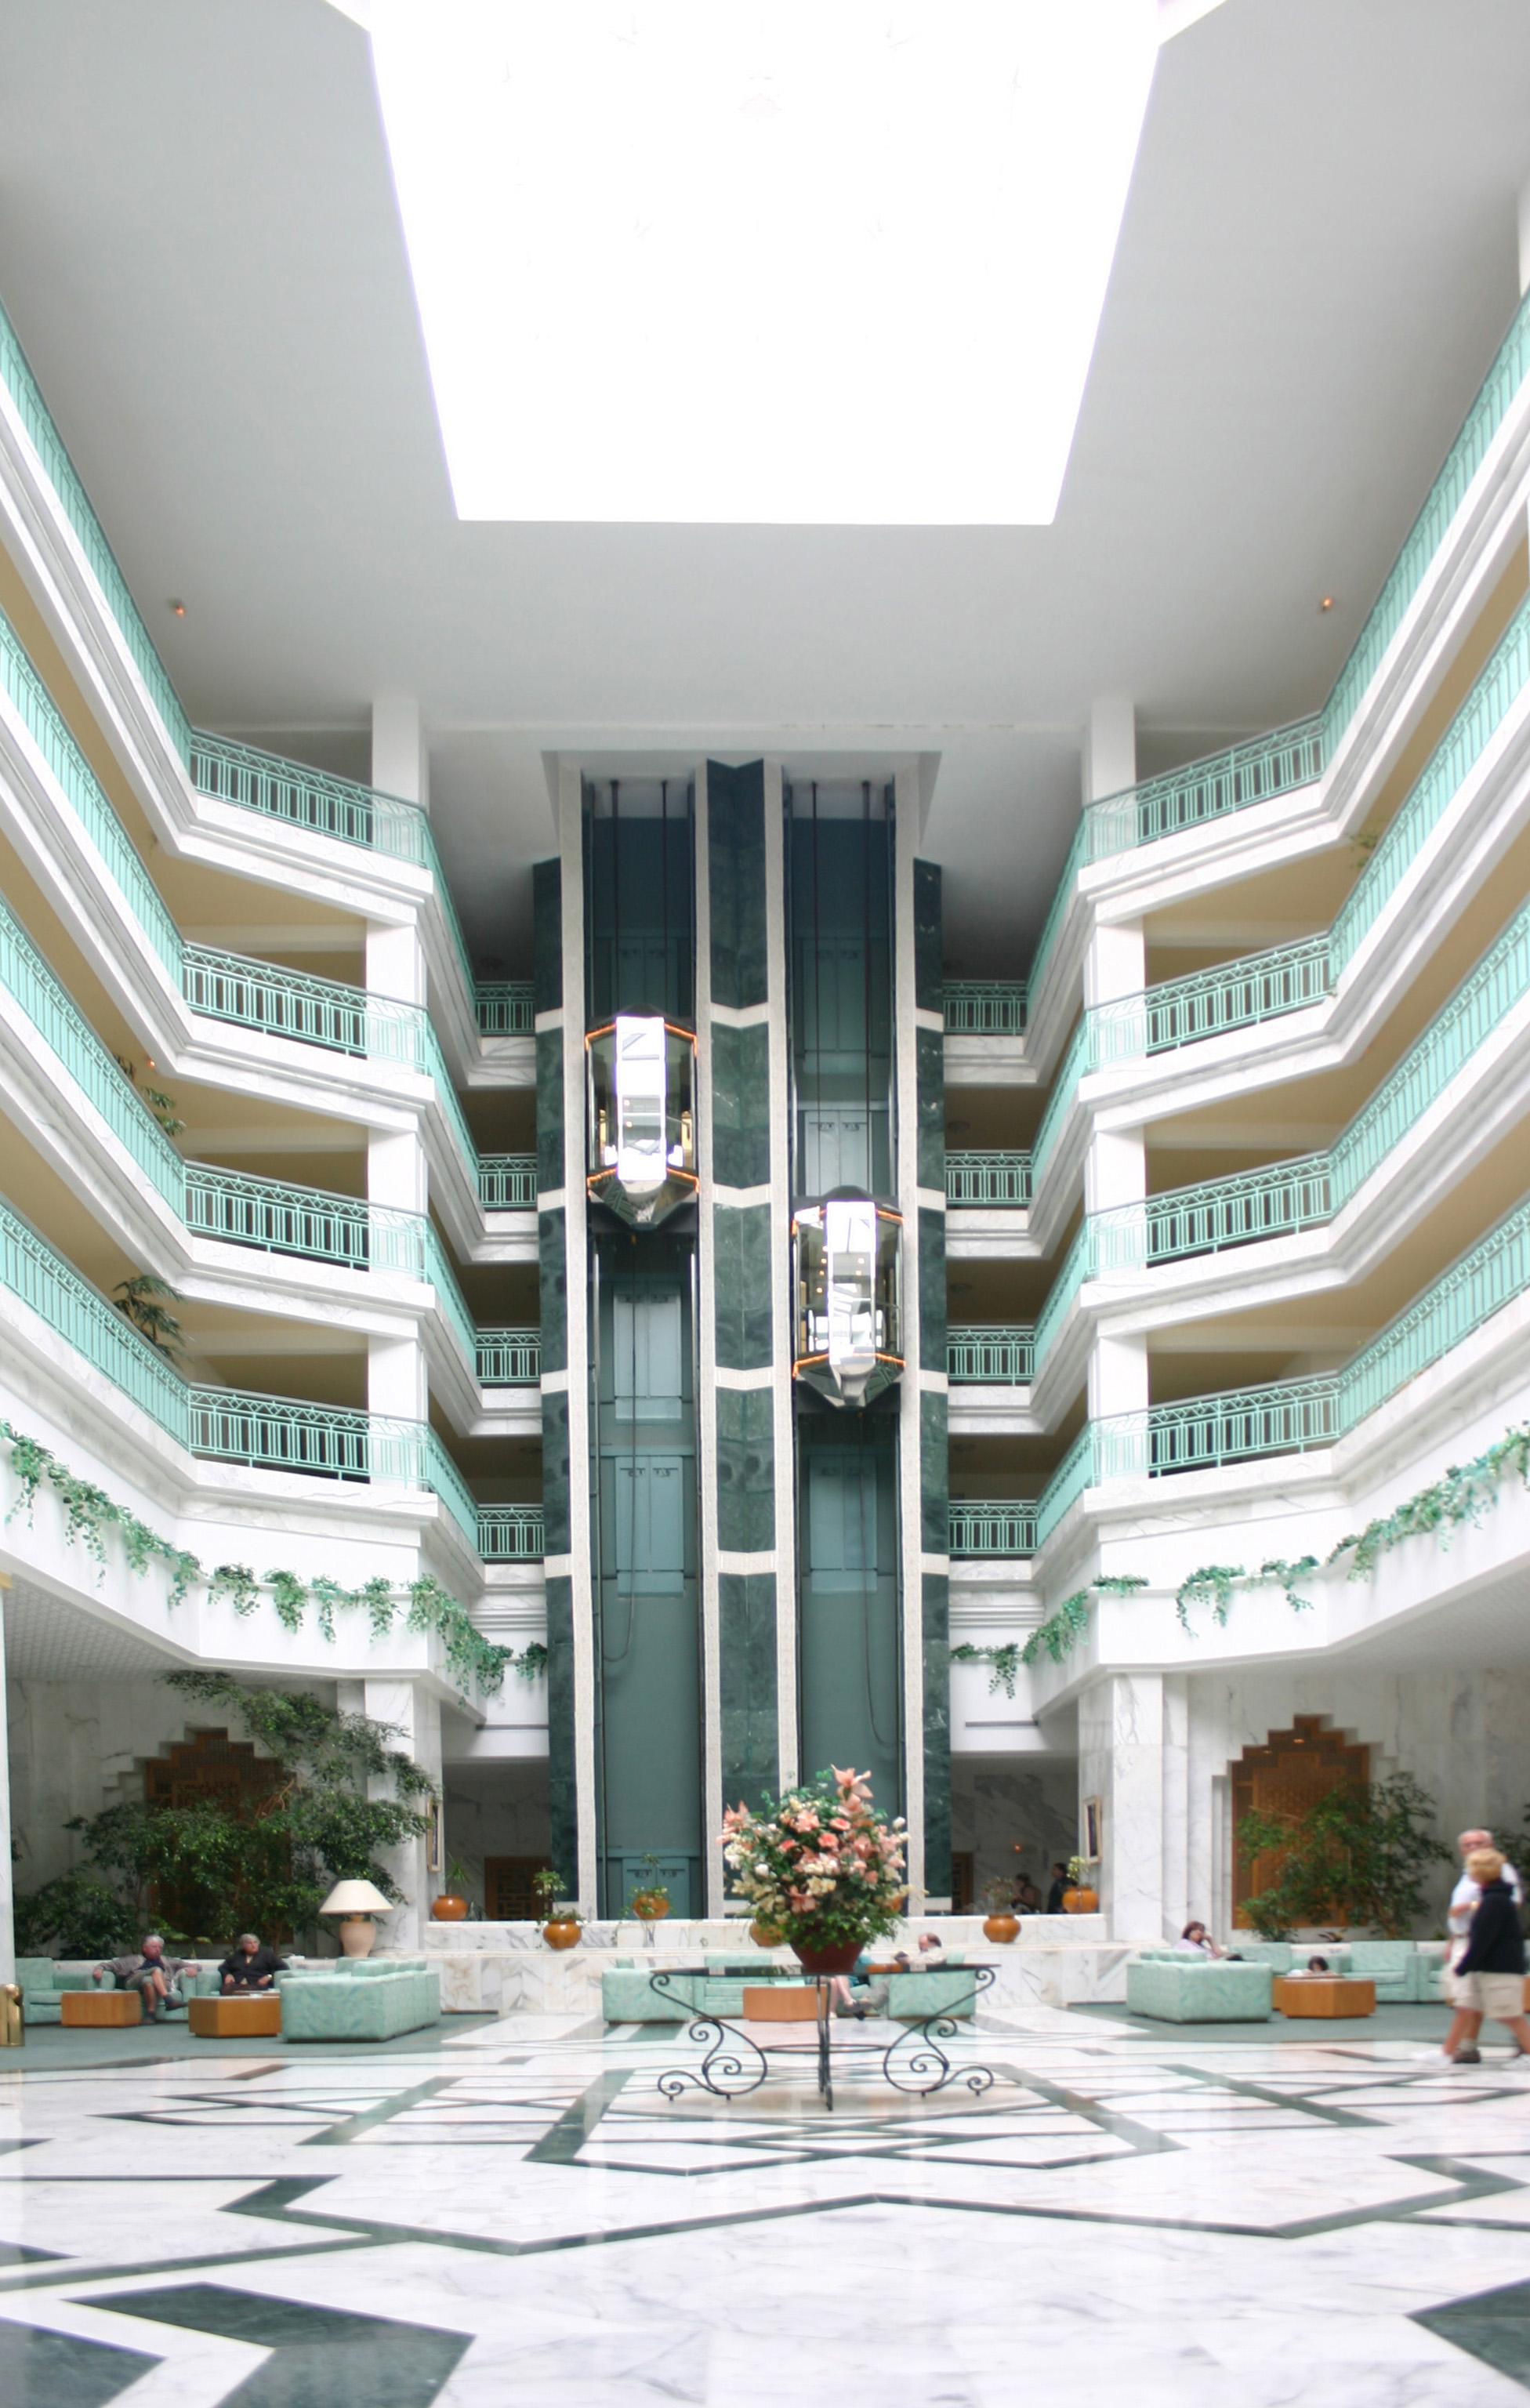 Foyer In Hotel : File hotel foyer g wikimedia commons